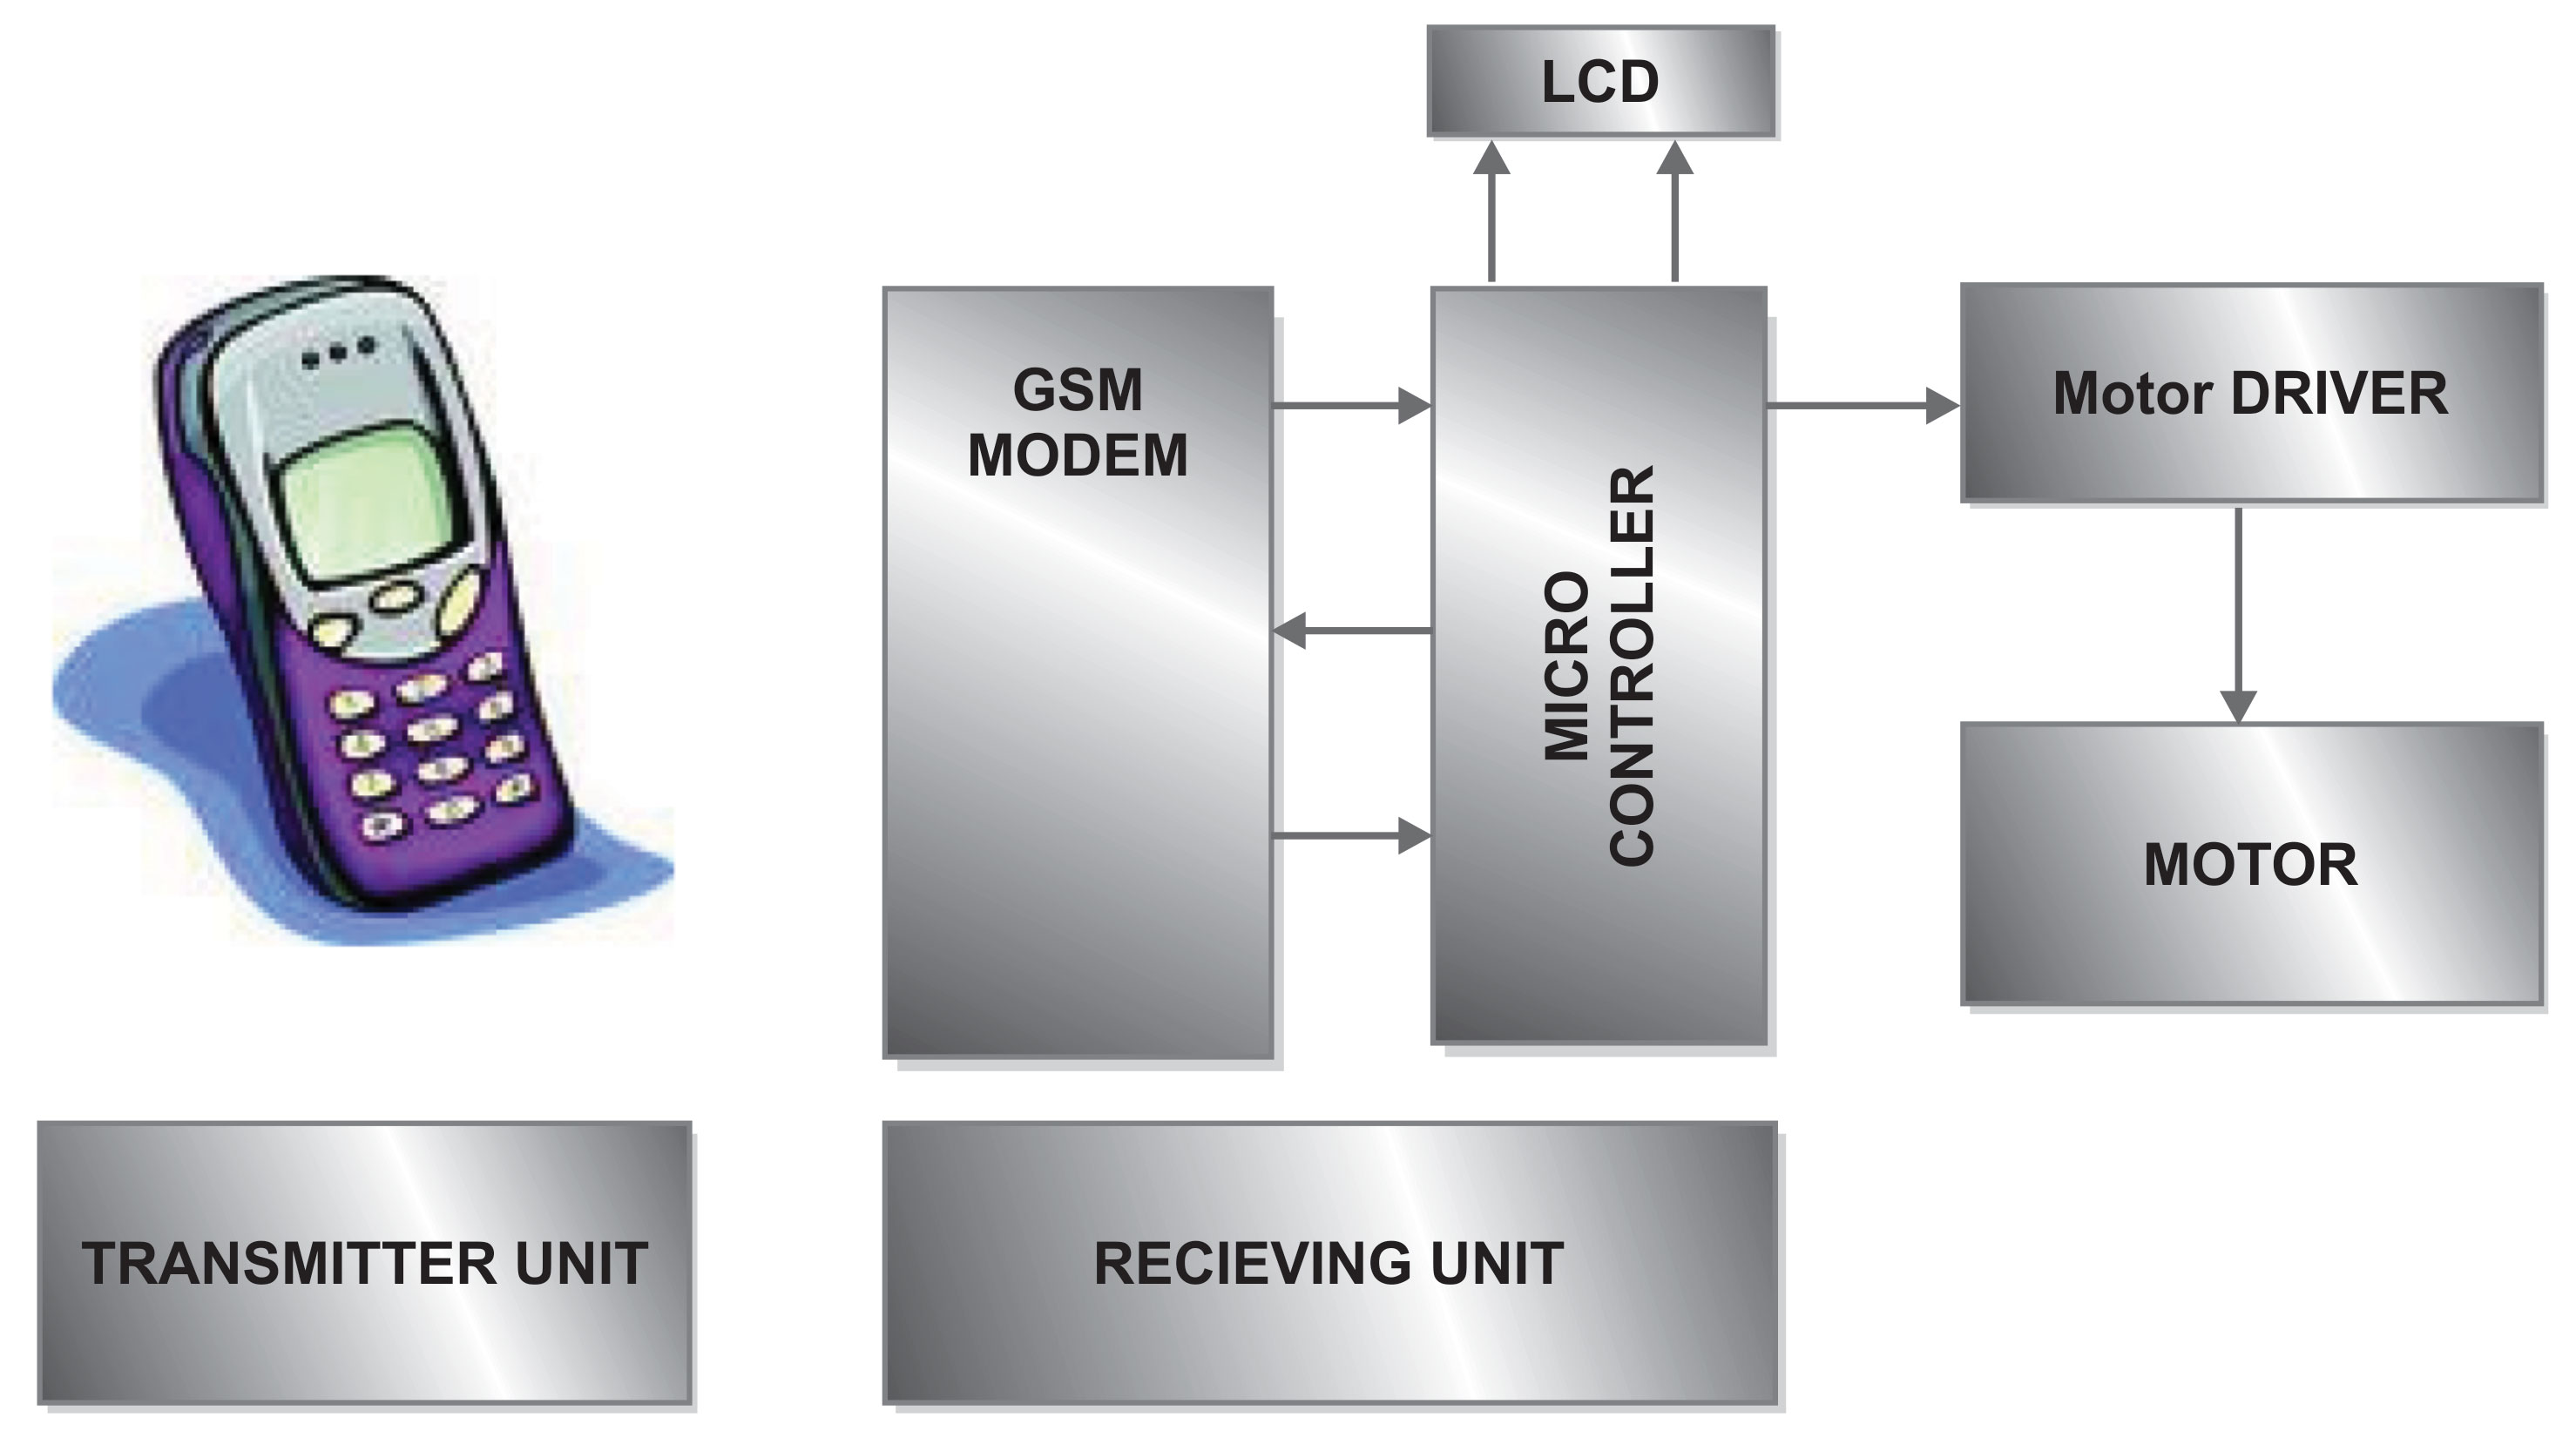 dtmf decoder ic mt8870 pin diagram 2004 dodge ram 1500 7 trailer wiring electrical india